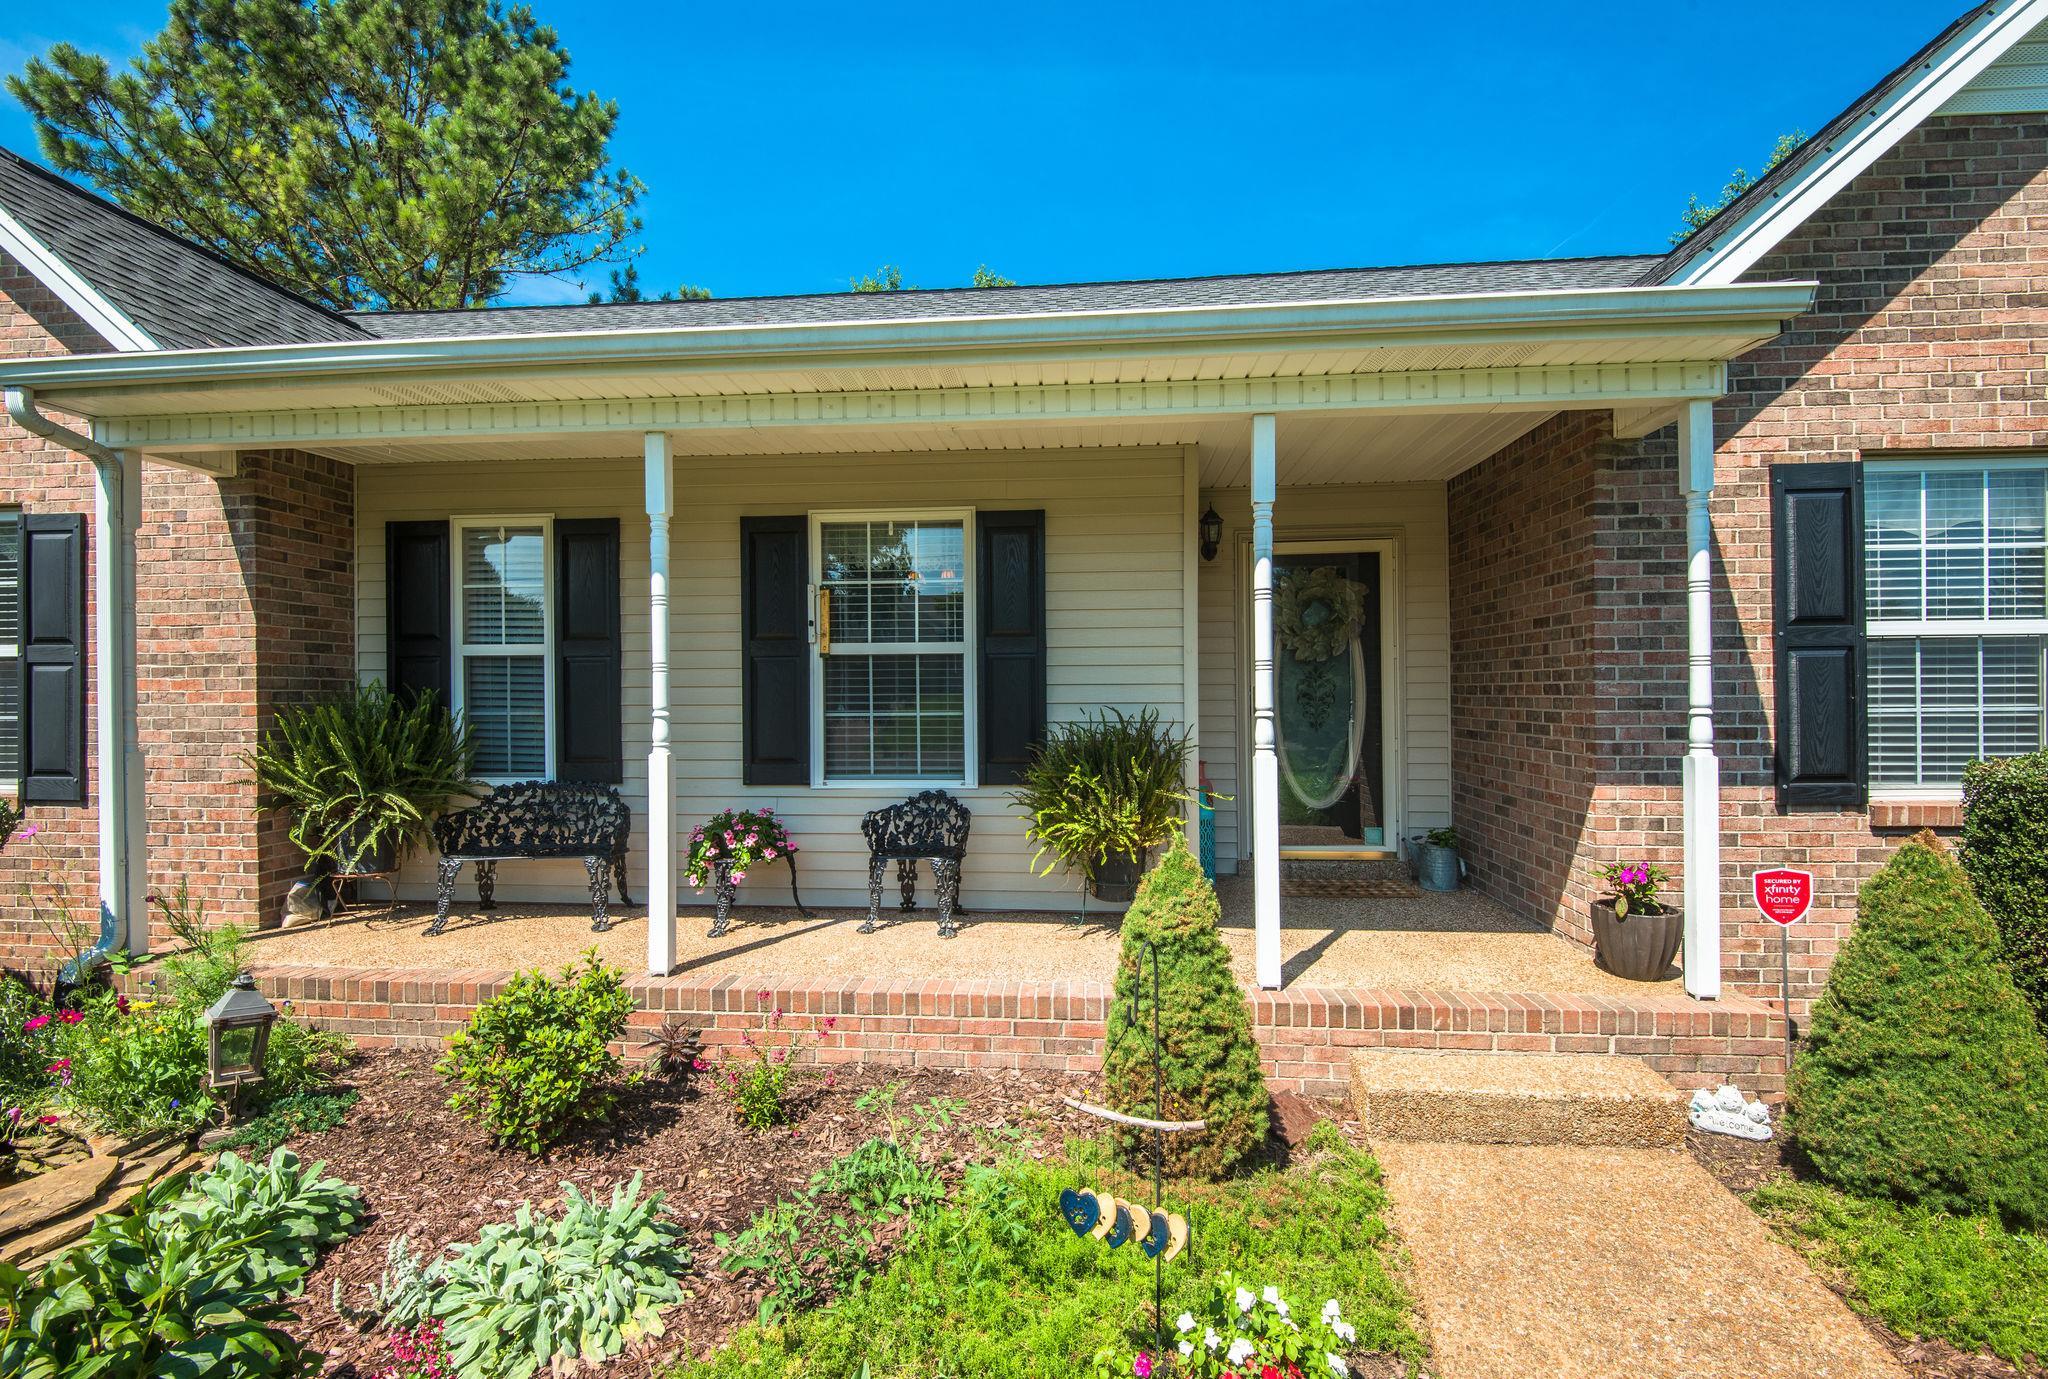 7805 Shauna Cir, Fairview, Tennessee